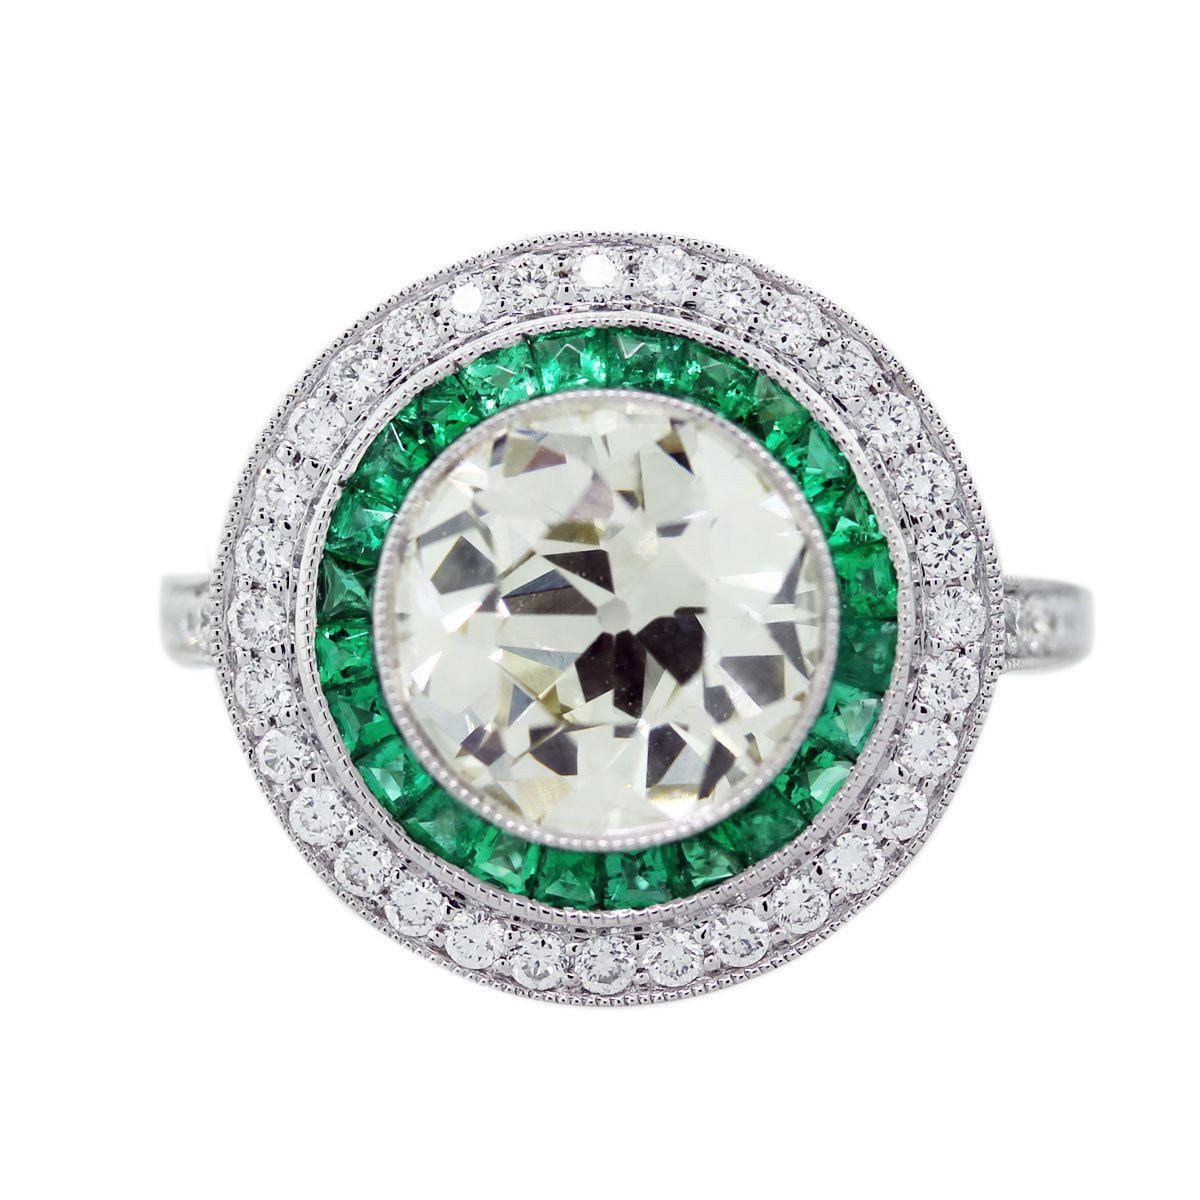 Emerald And Diamond Engagement Ring, Gemstone Halo Engagement Ring, Halo  Ring Emeralds Vintage Style